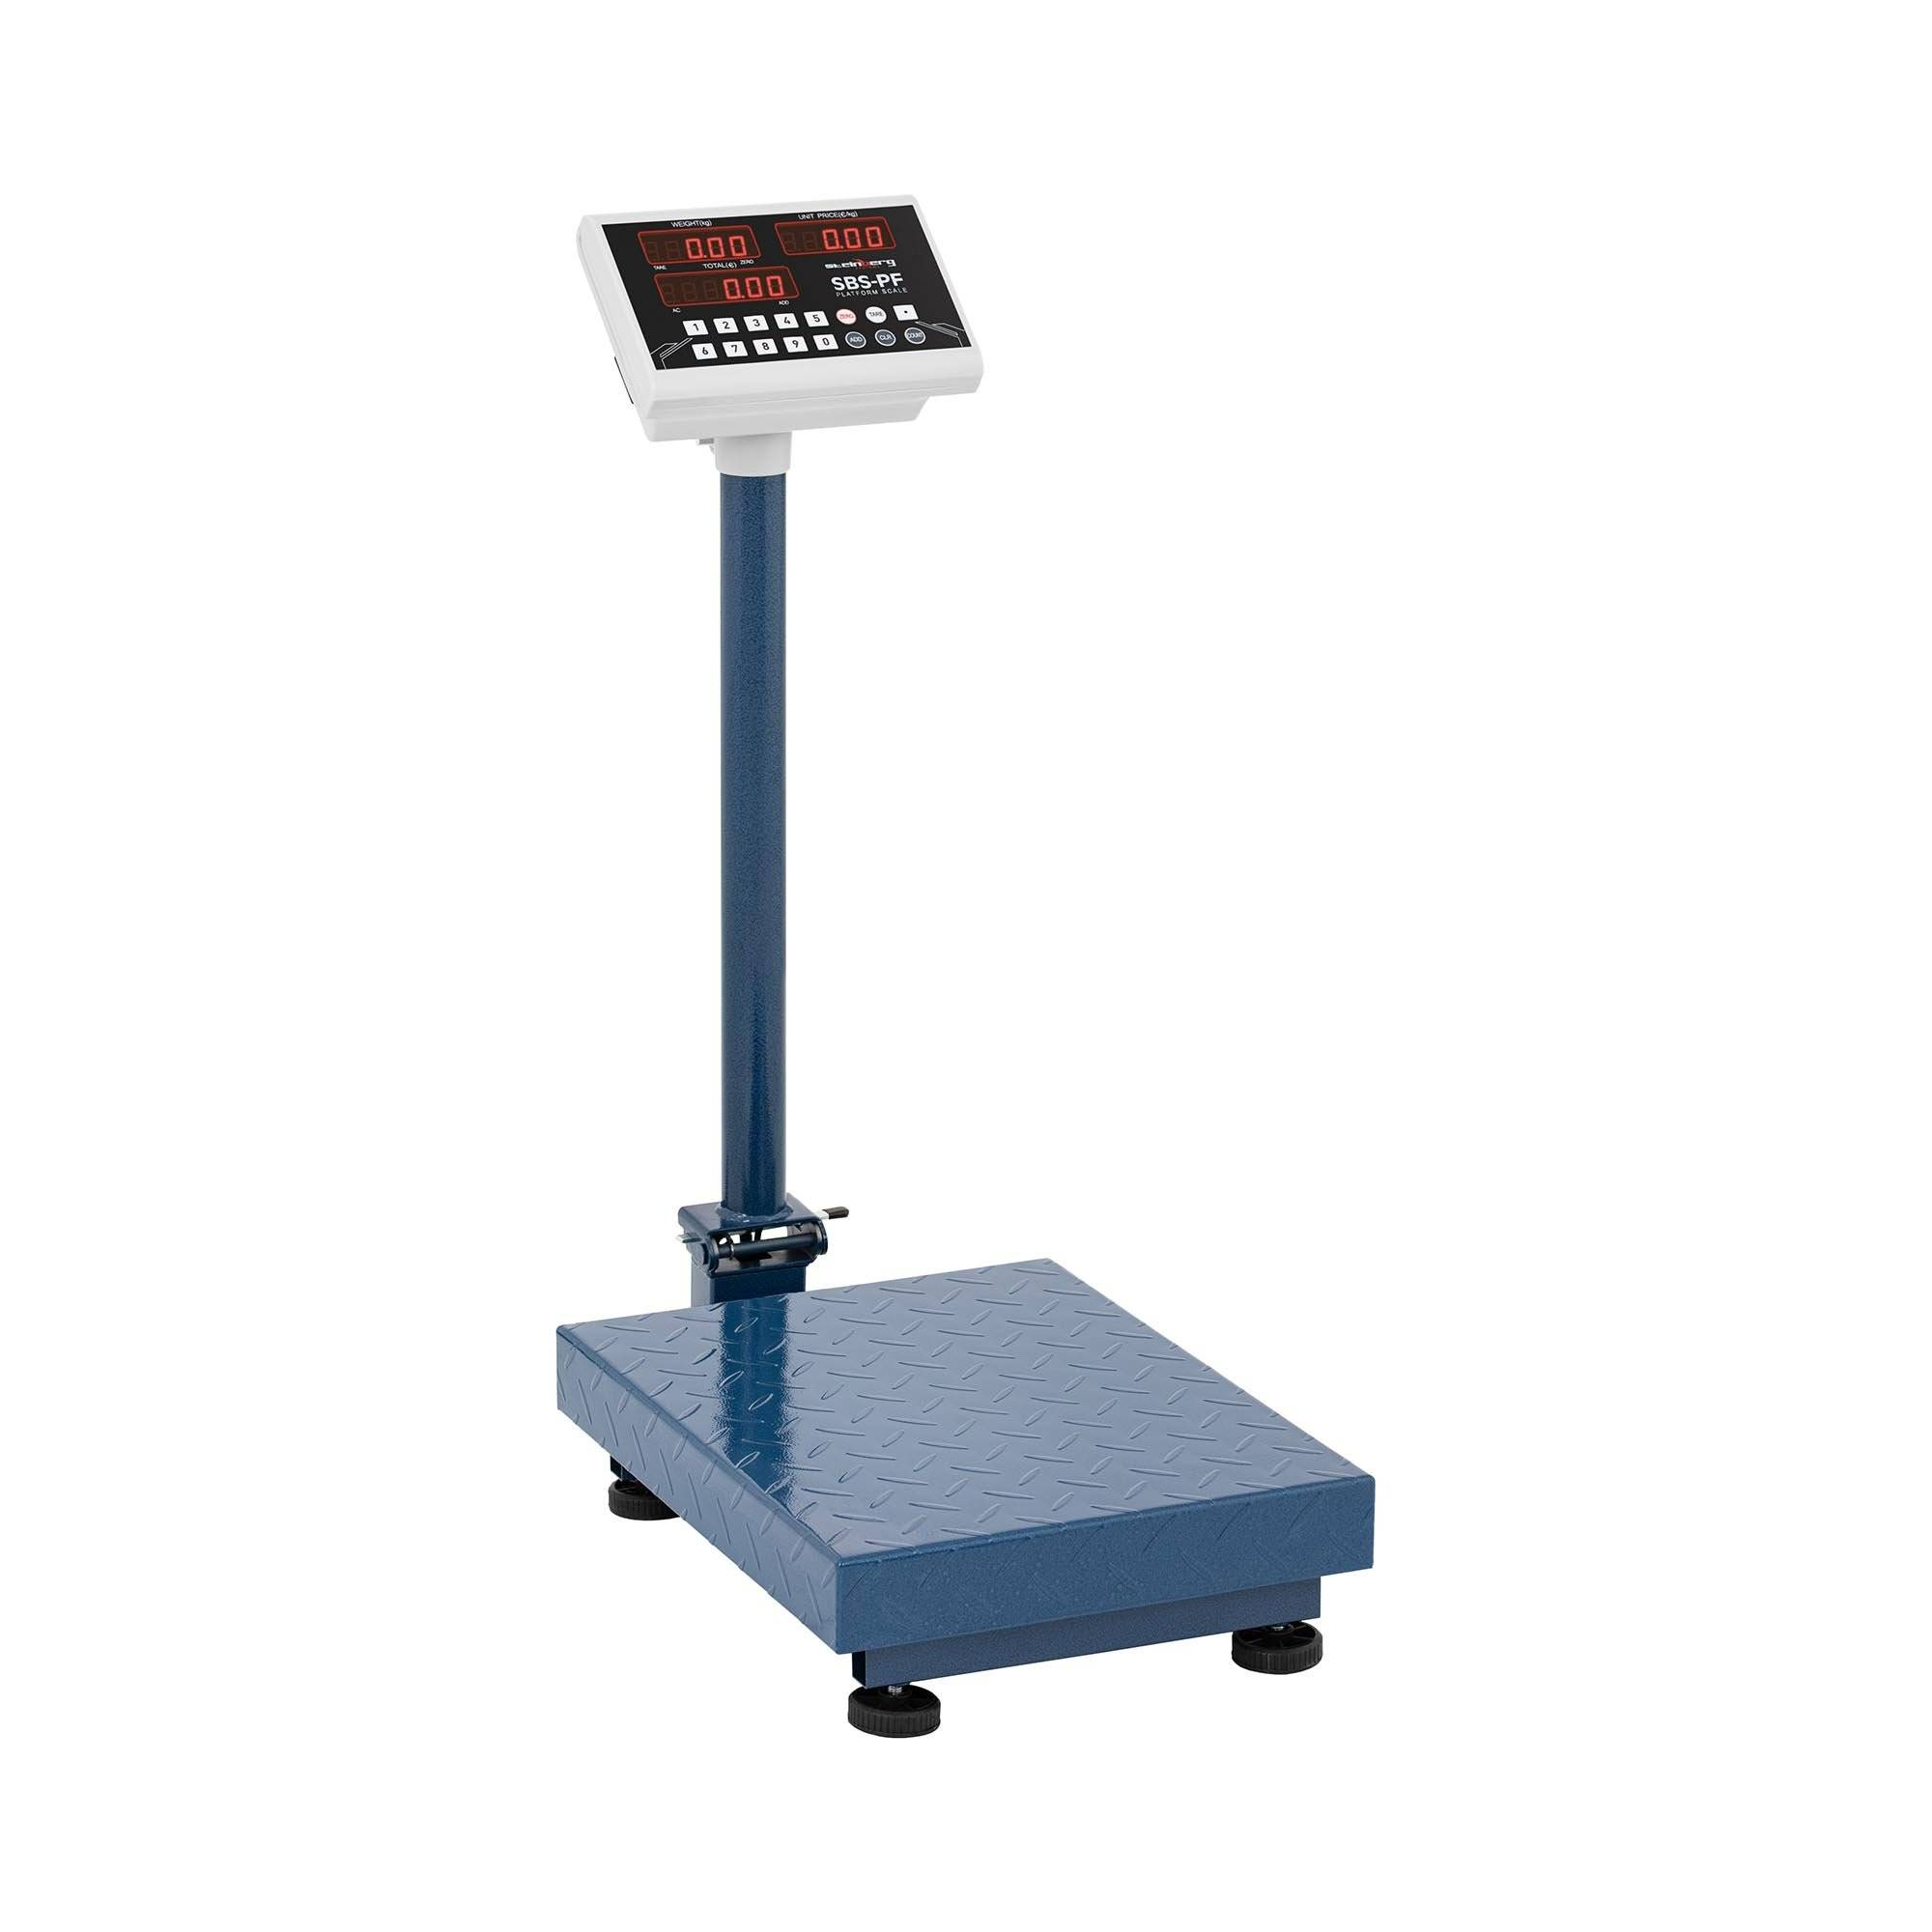 Steinberg Platform Scales - 100 kg / 10 g - foldable